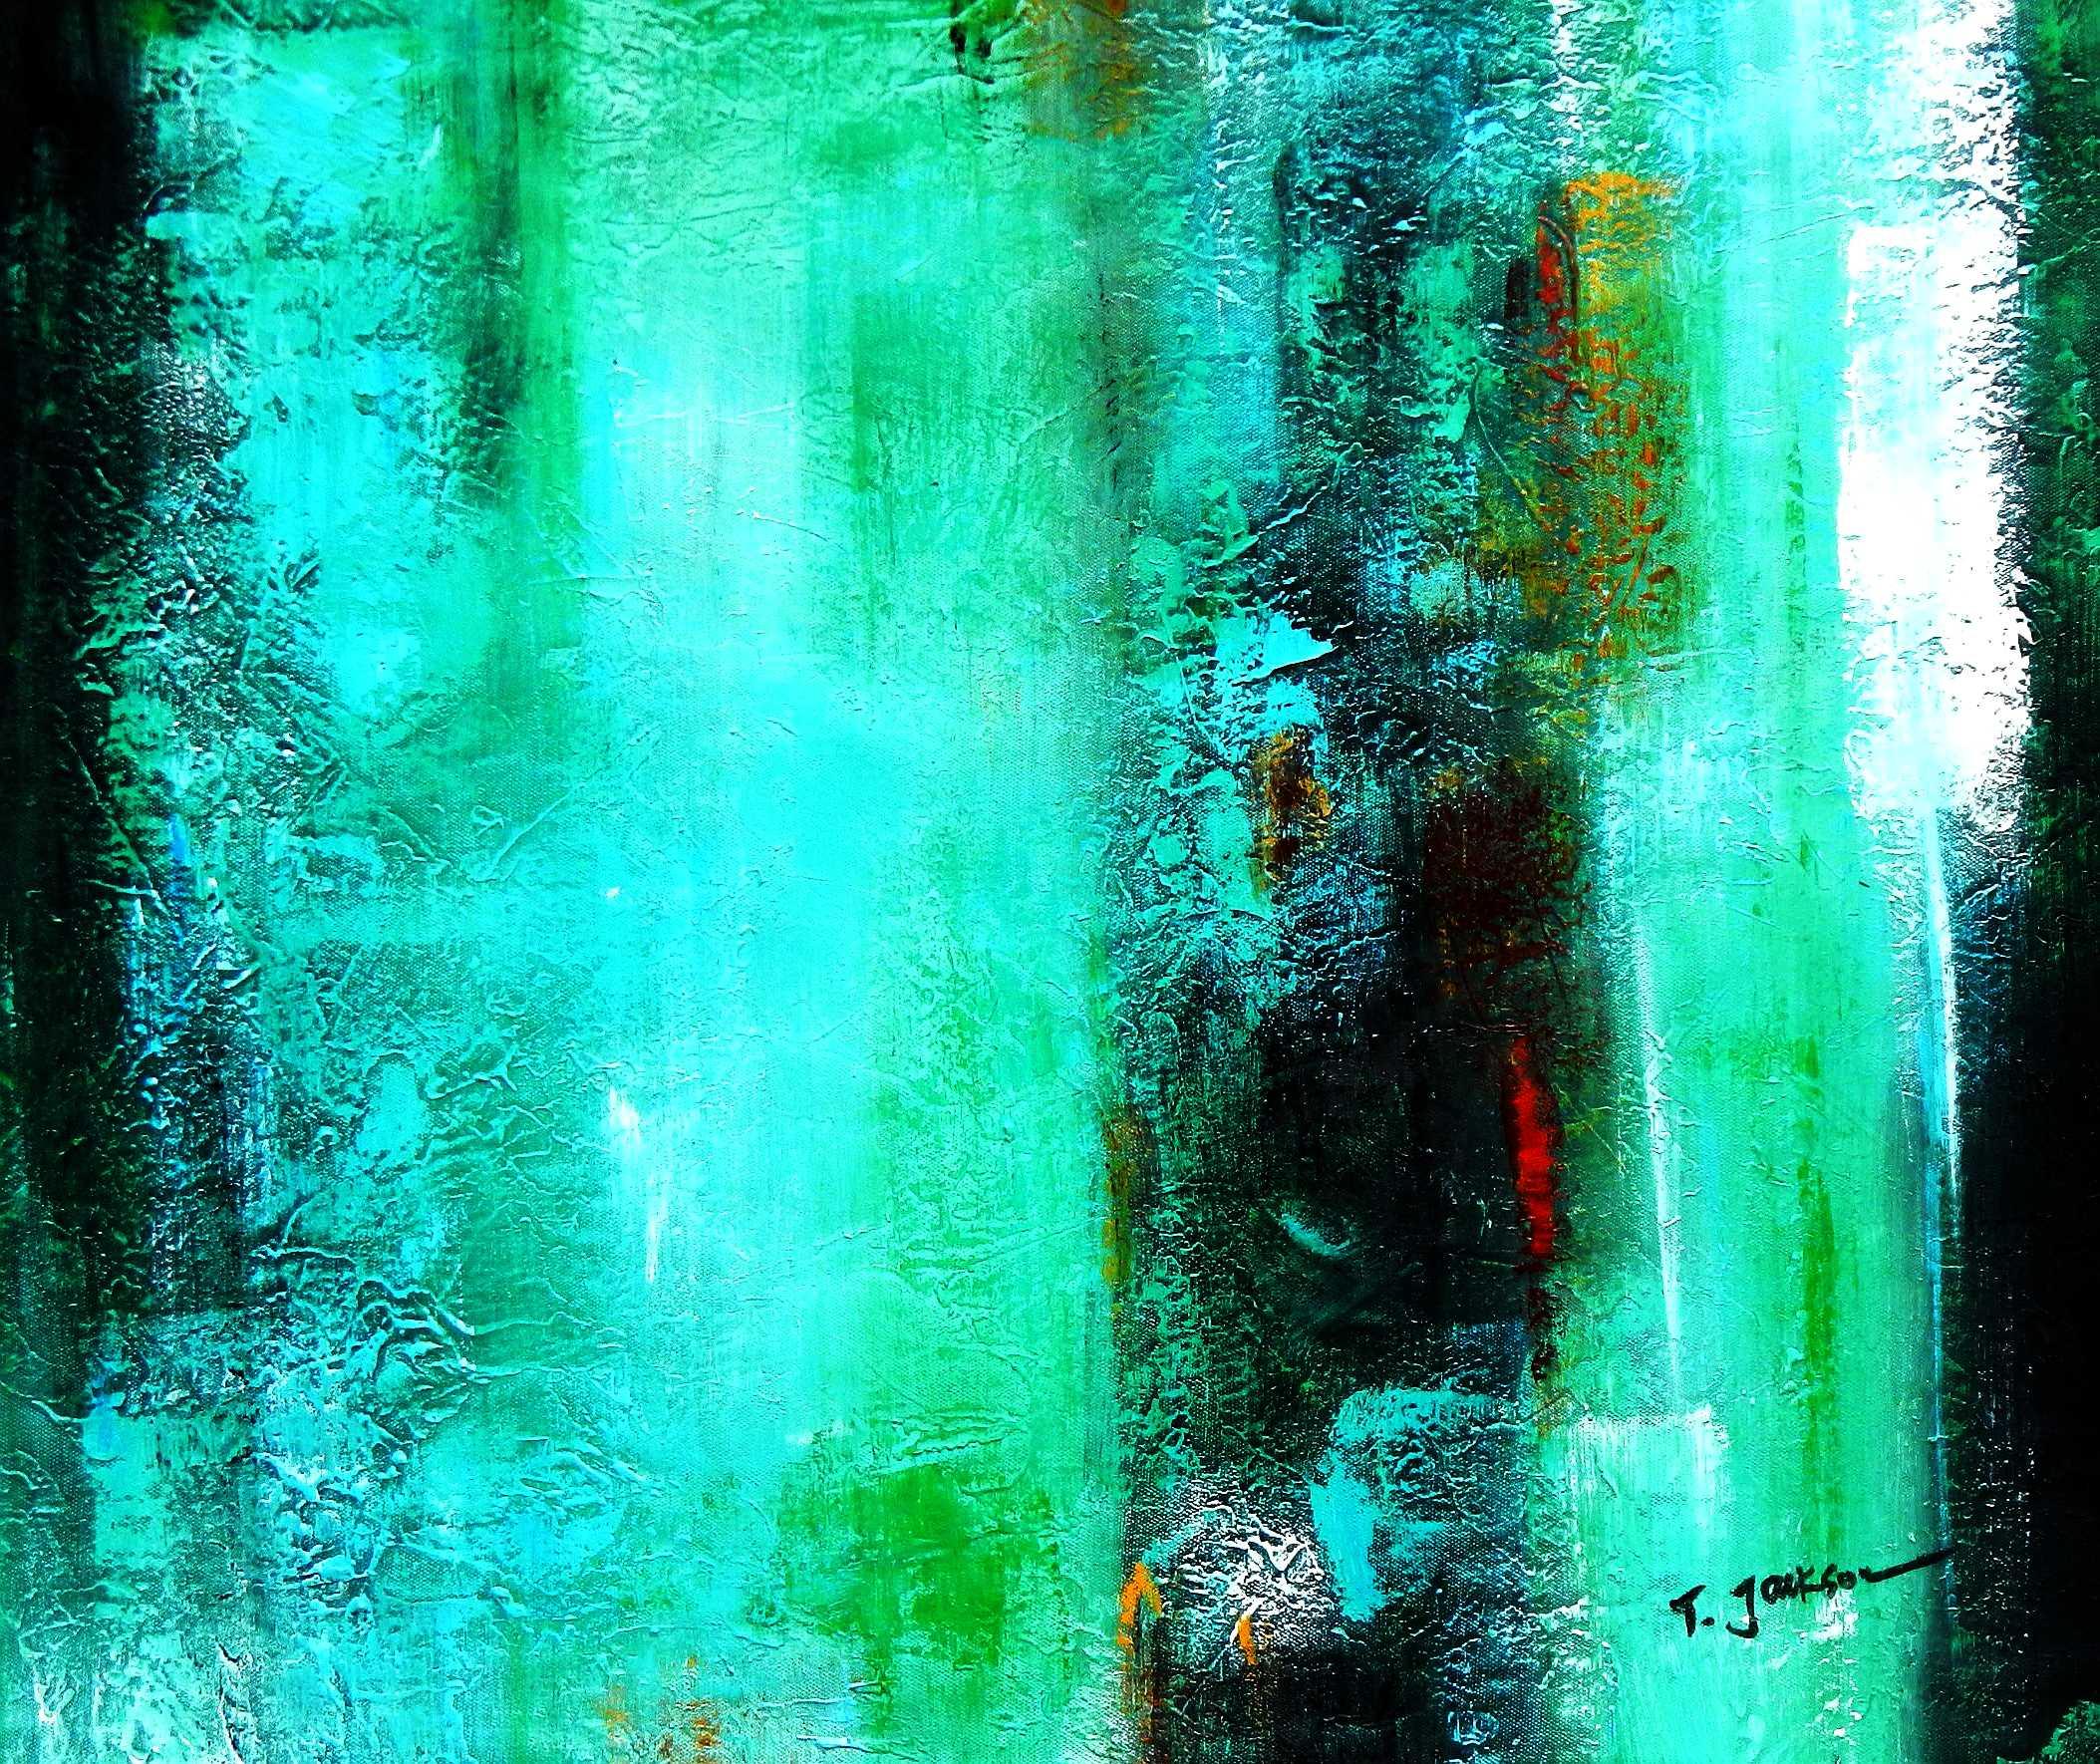 Abstract - Ireland Summer games c95772 50x60cm abstraktes Gemälde